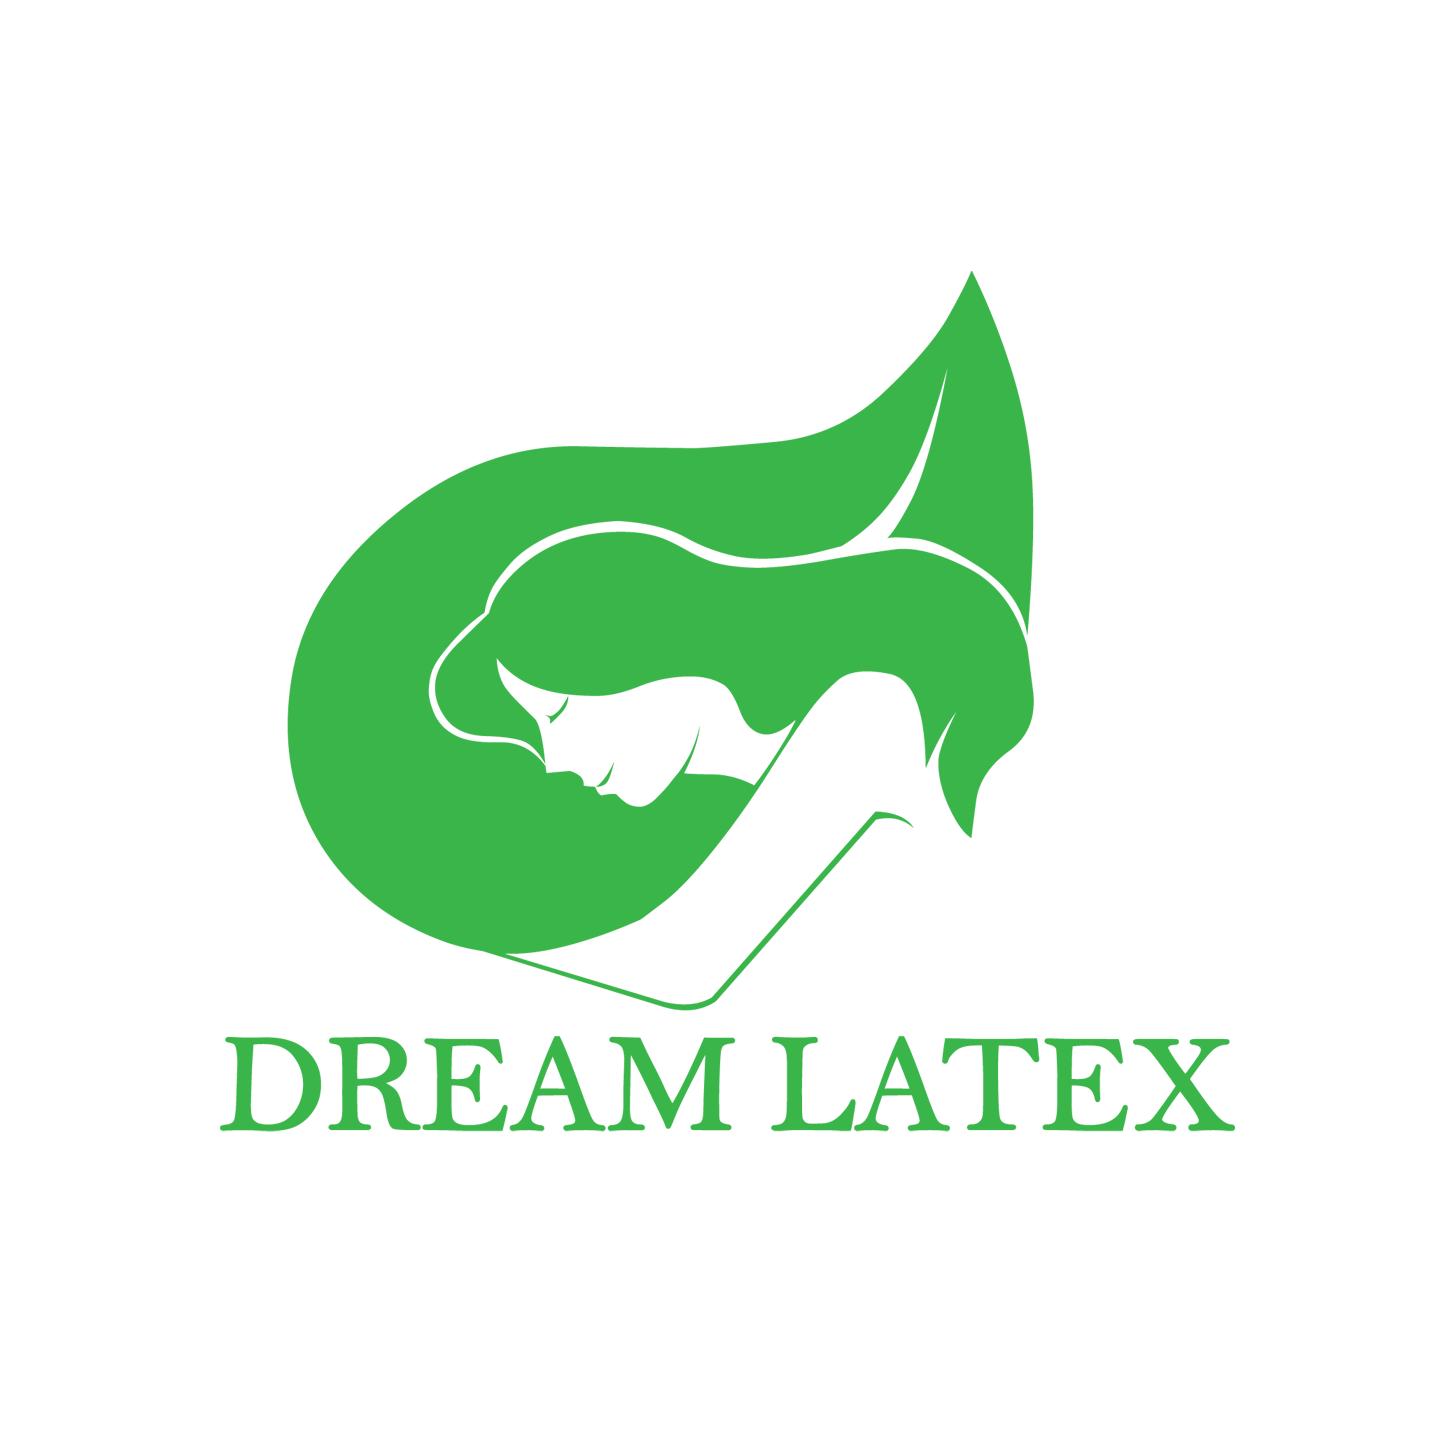 Sribu logo design desain logo untuk dream latex a018fba9a5 buycottarizona Images